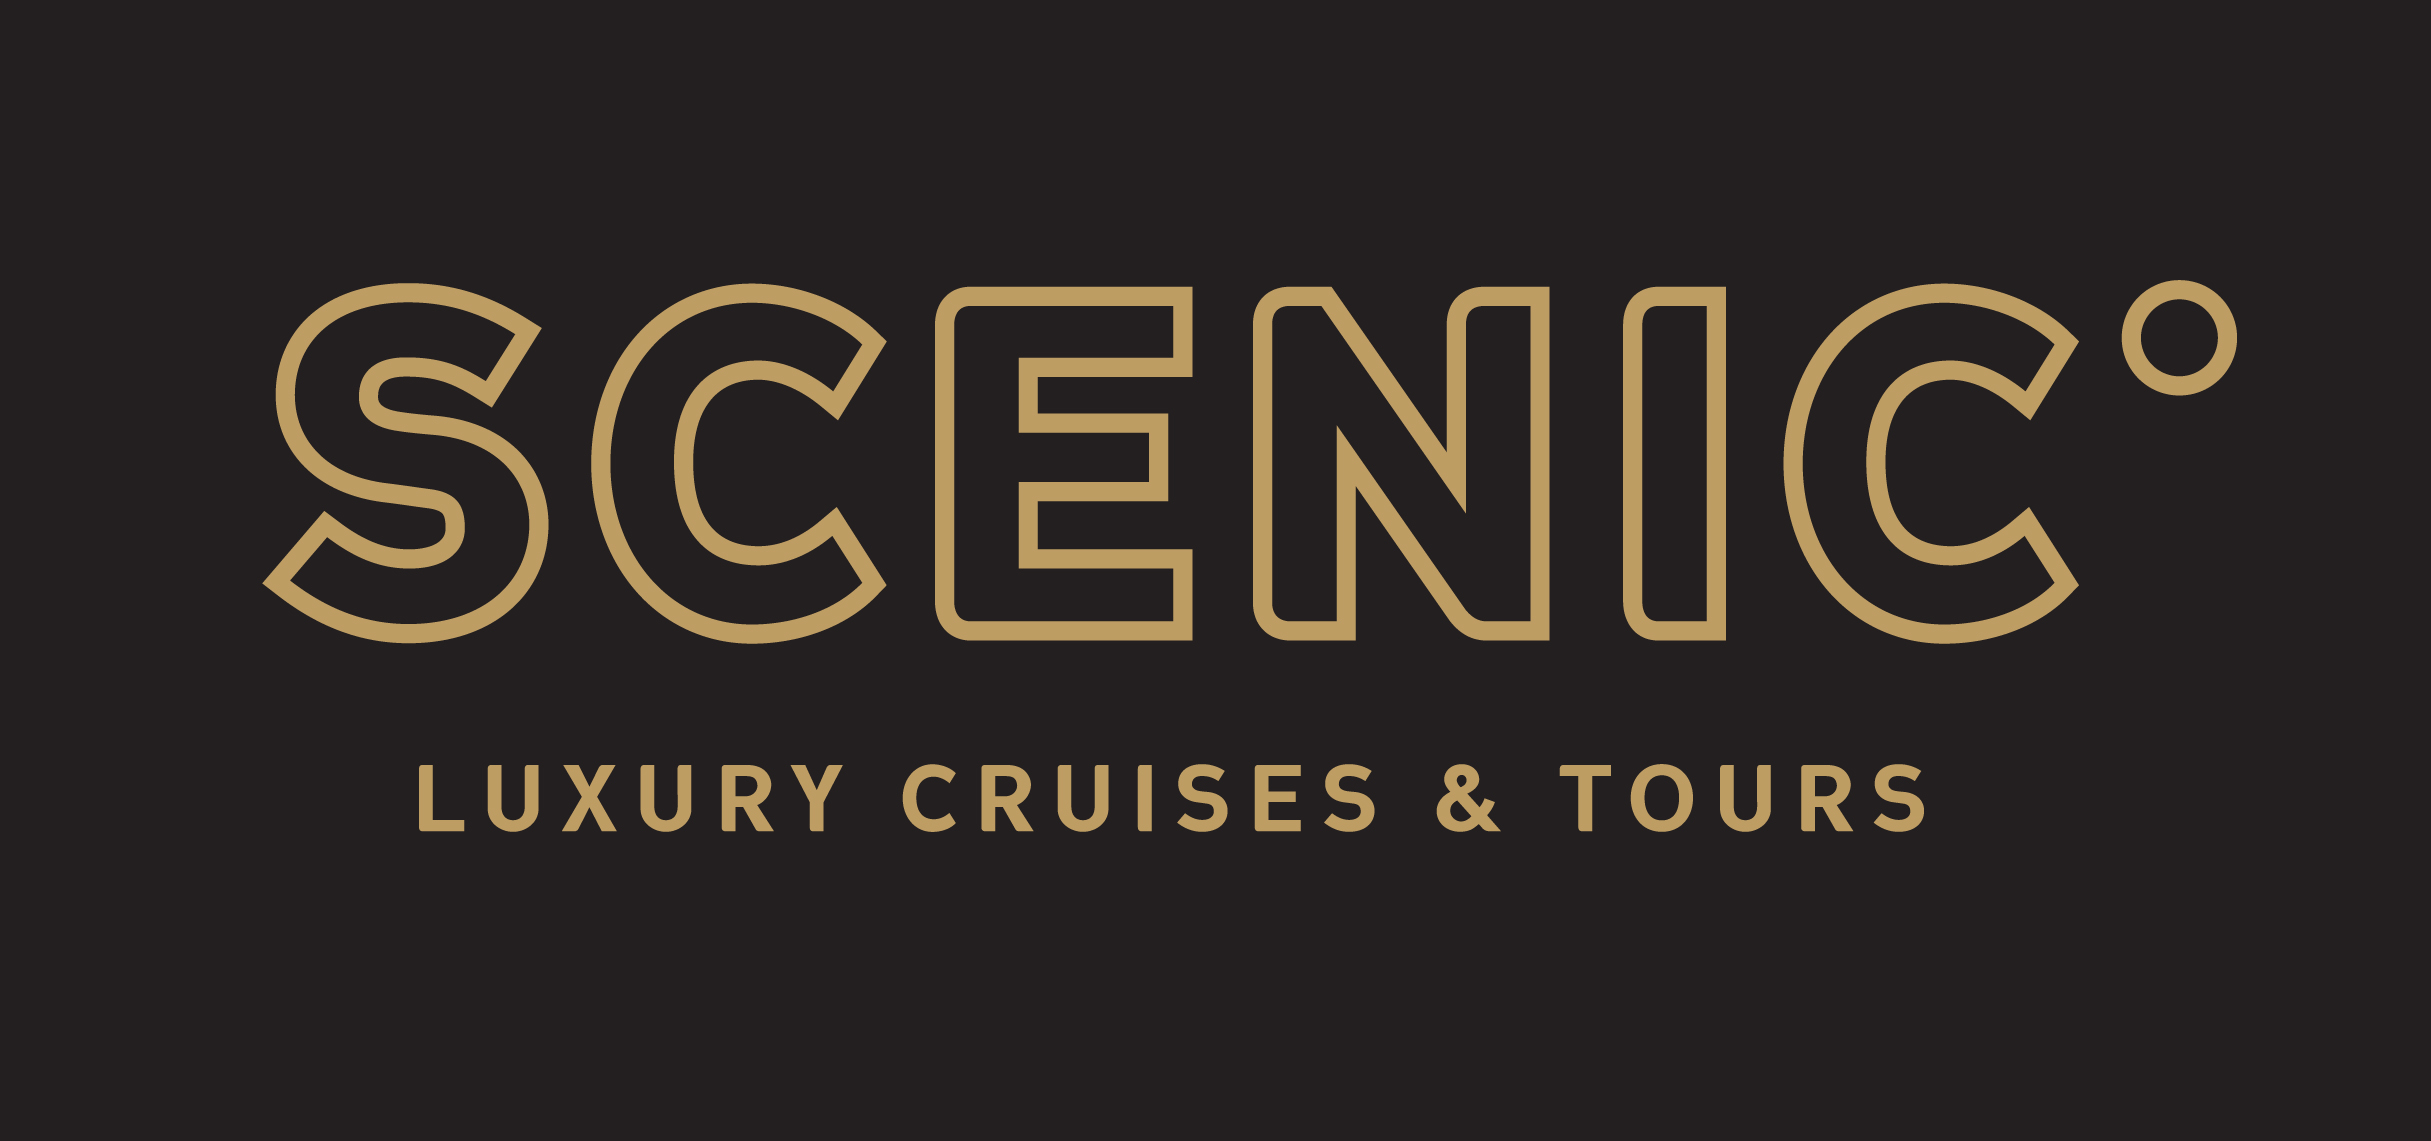 Scenic new logo